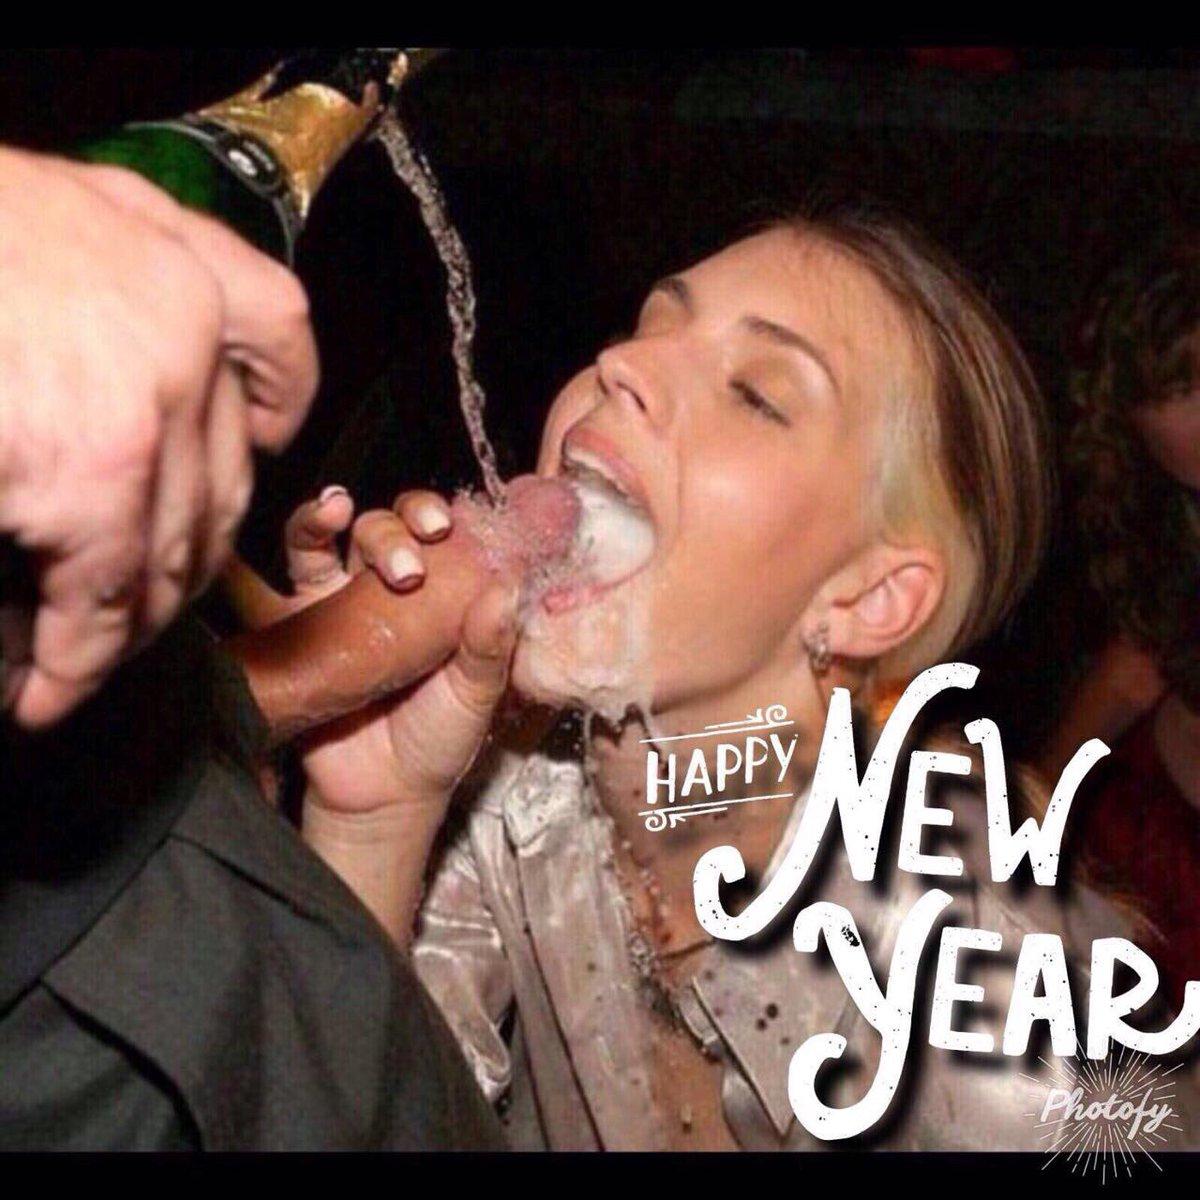 Happy New Year to everyone 🎊🎉🥂🍾🤪 2415Nj1heC